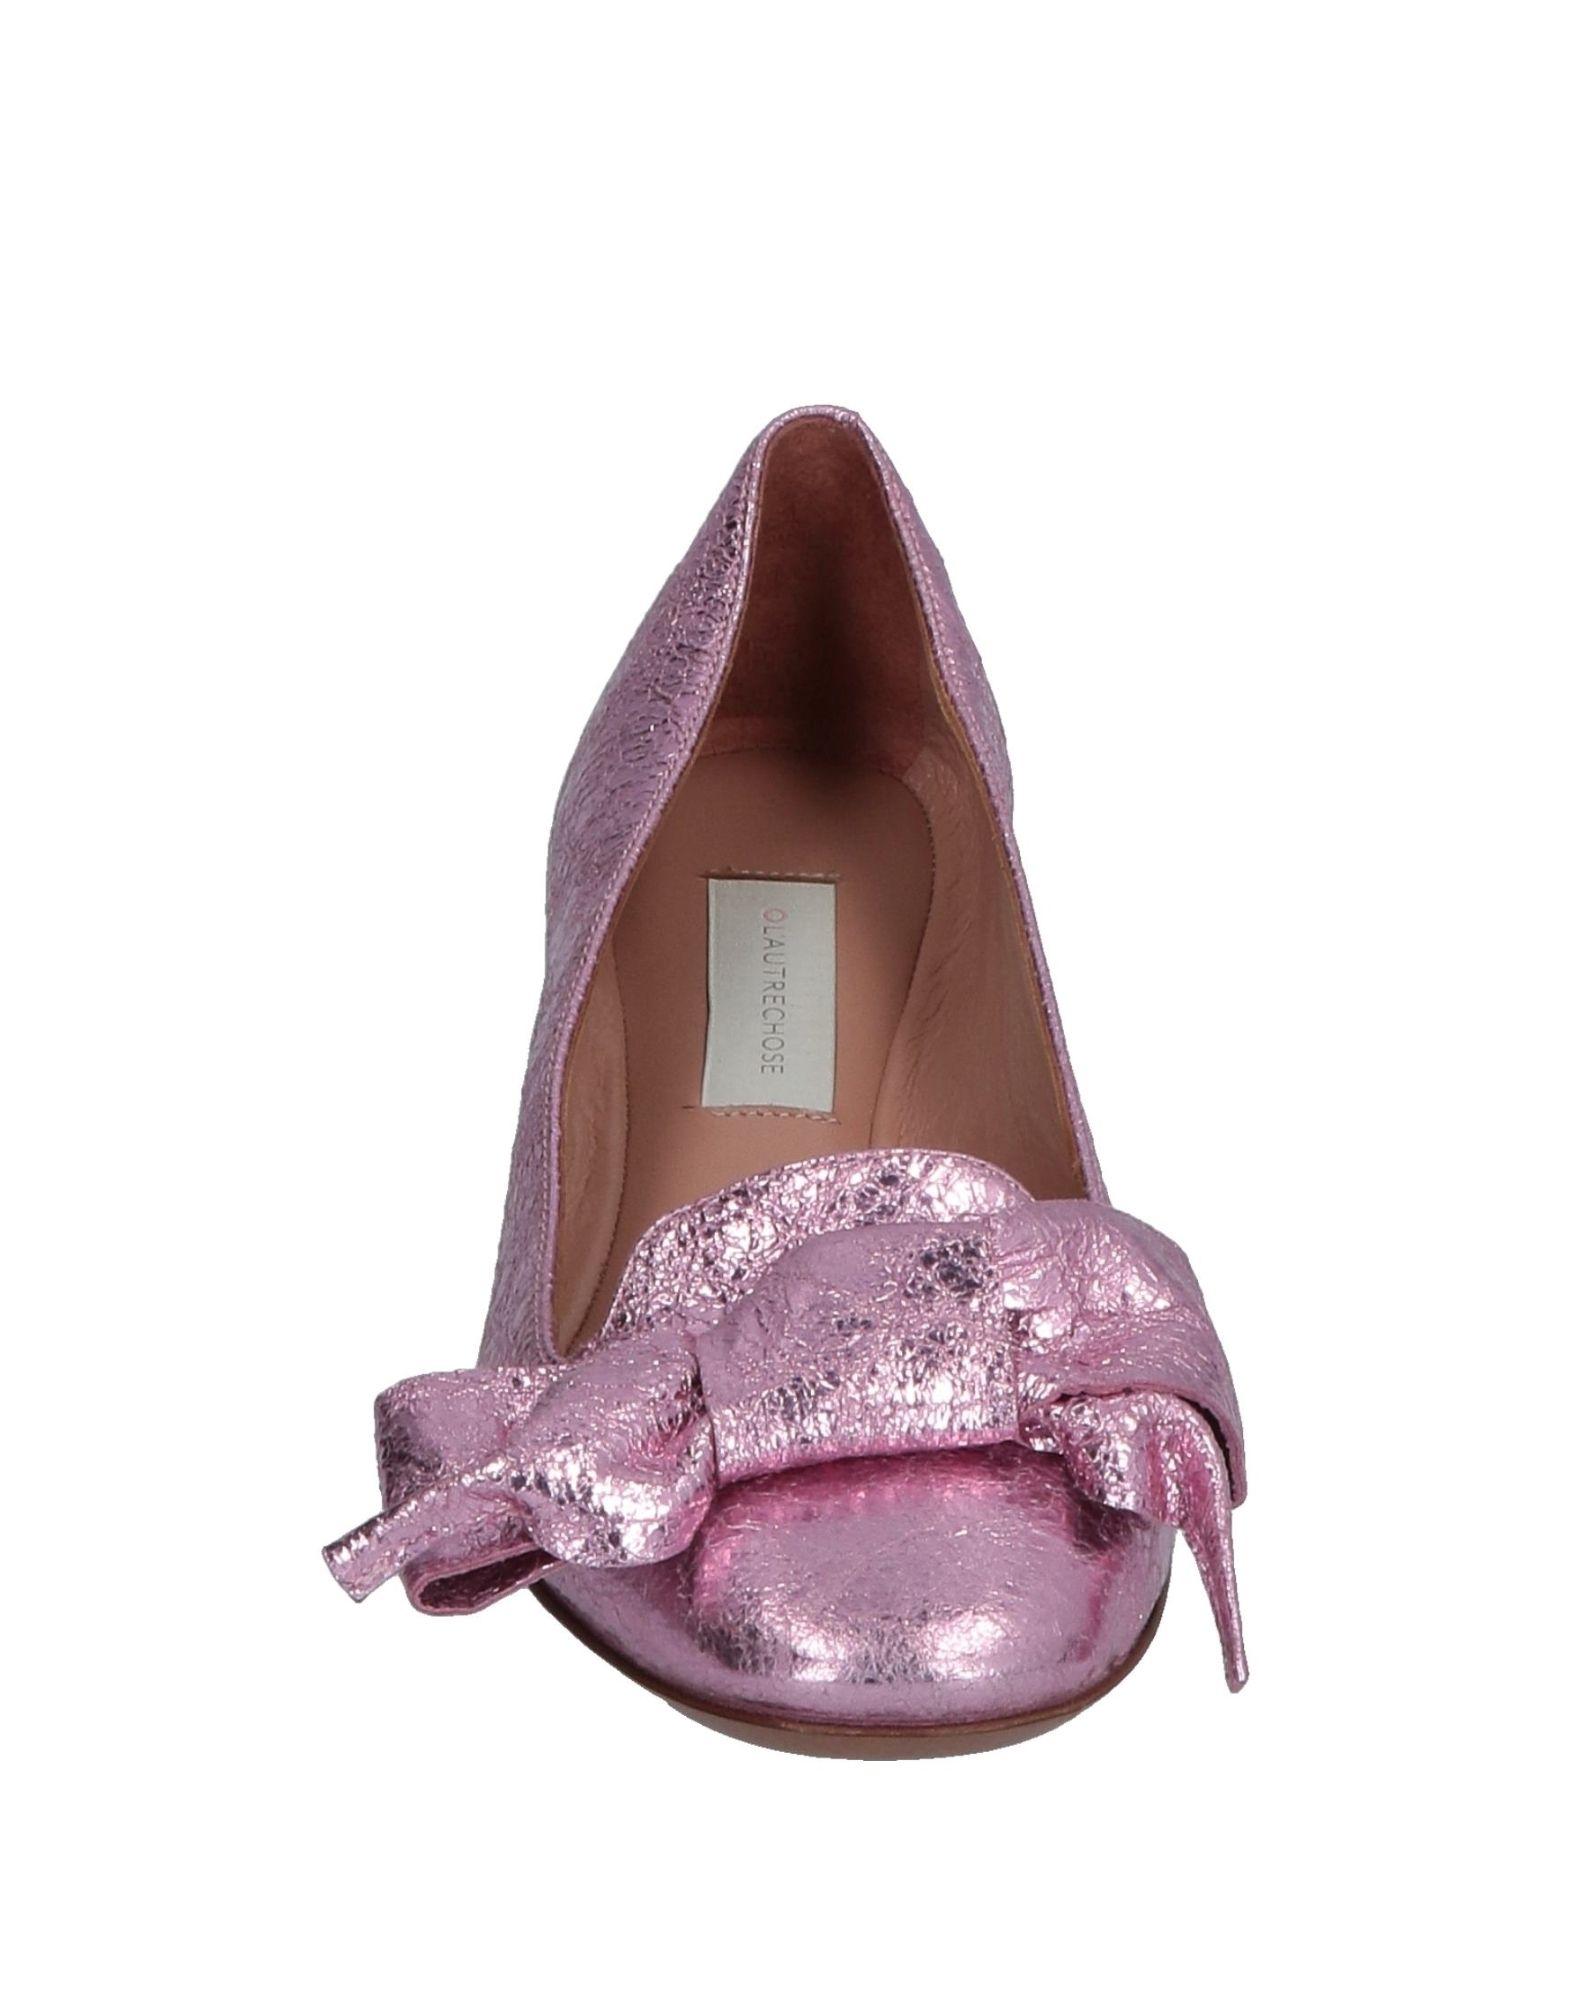 L' Preis-Leistungs-Verhältnis, Autre Chose Ballerinas Damen Gutes Preis-Leistungs-Verhältnis, L' es lohnt sich 76a3ca